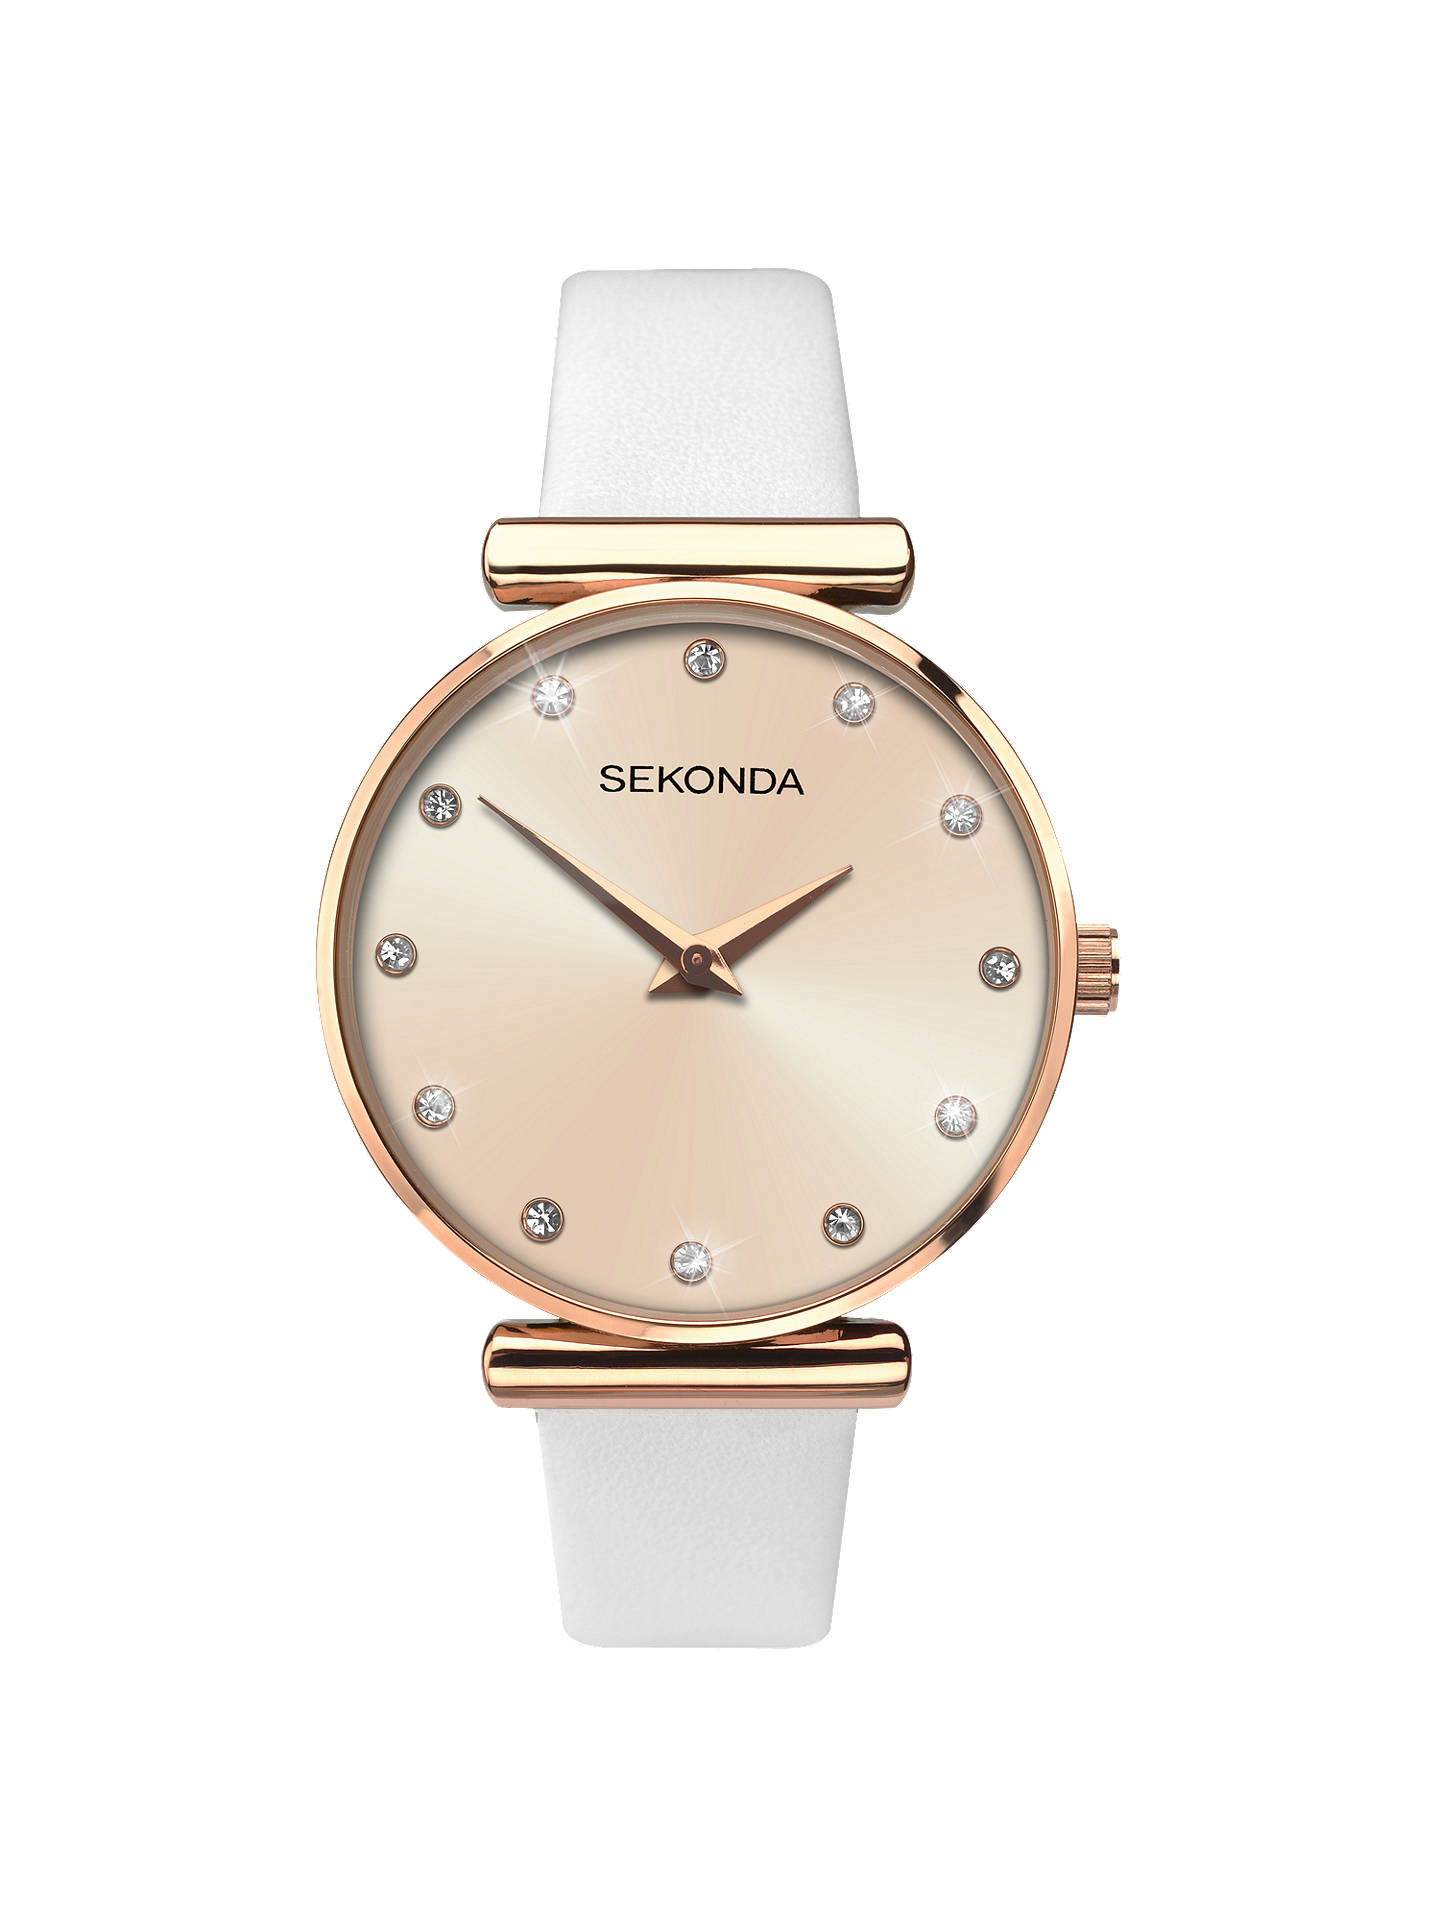 65904195ac Buy Sekonda 2472.27 Women's Sparkle Leather Strap Watch, White/Gold Online  at johnlewis.